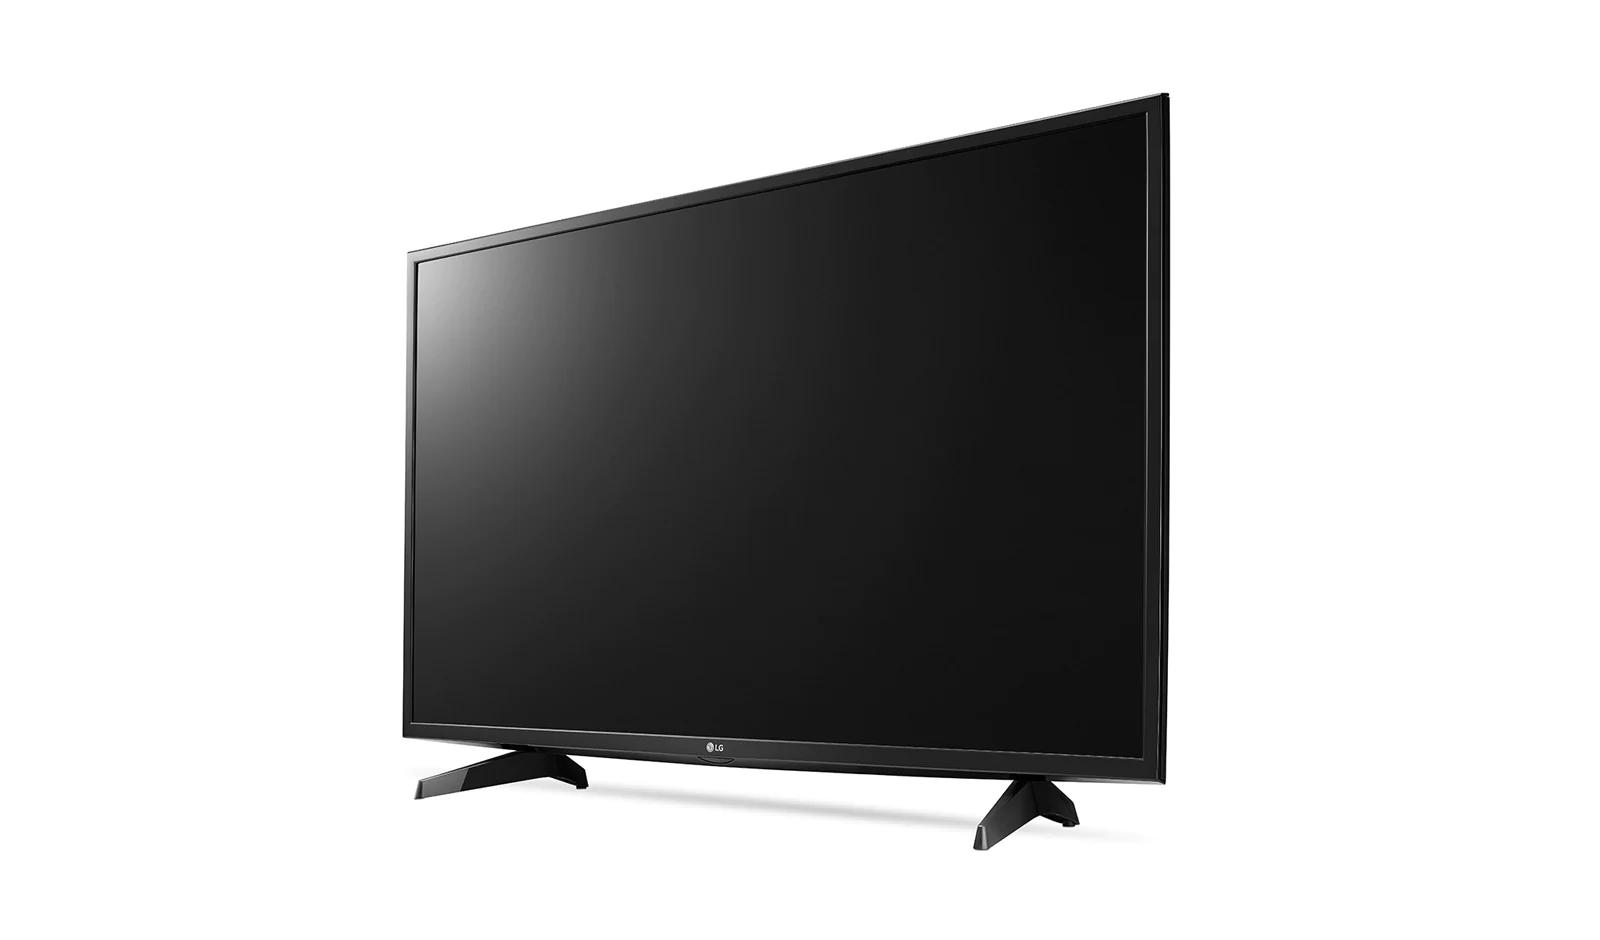 Televizor LG LED 49LJ515V 803RAGK24951 - 2